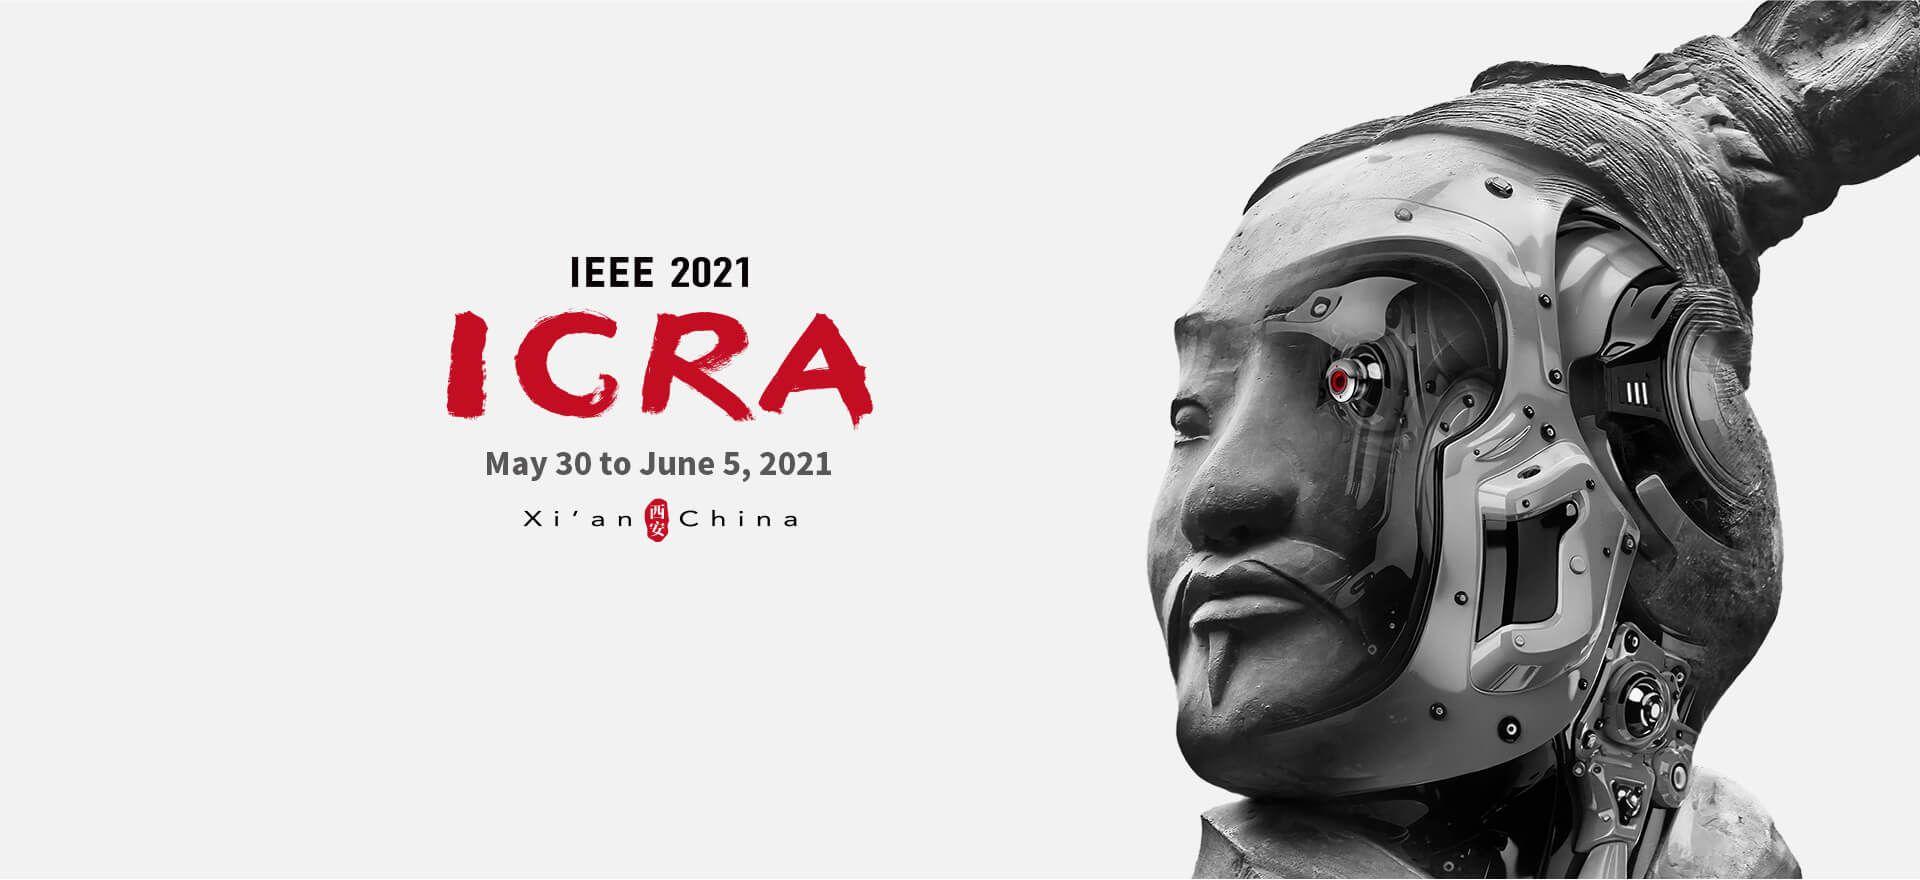 ICRA 2021 Graphic Image